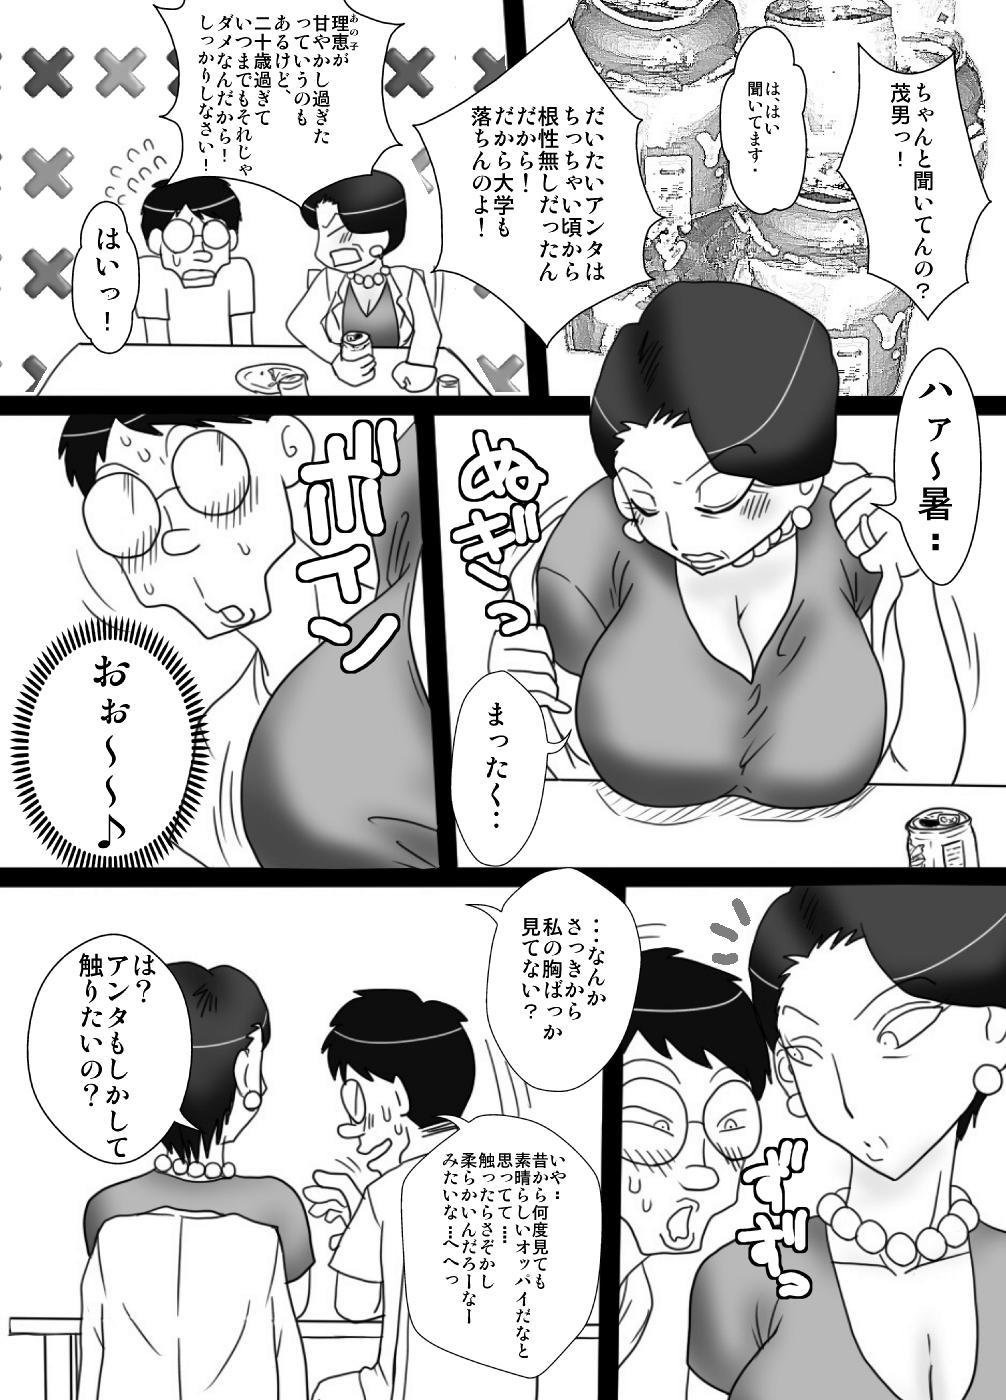 Oba-san o Otosuze! 5